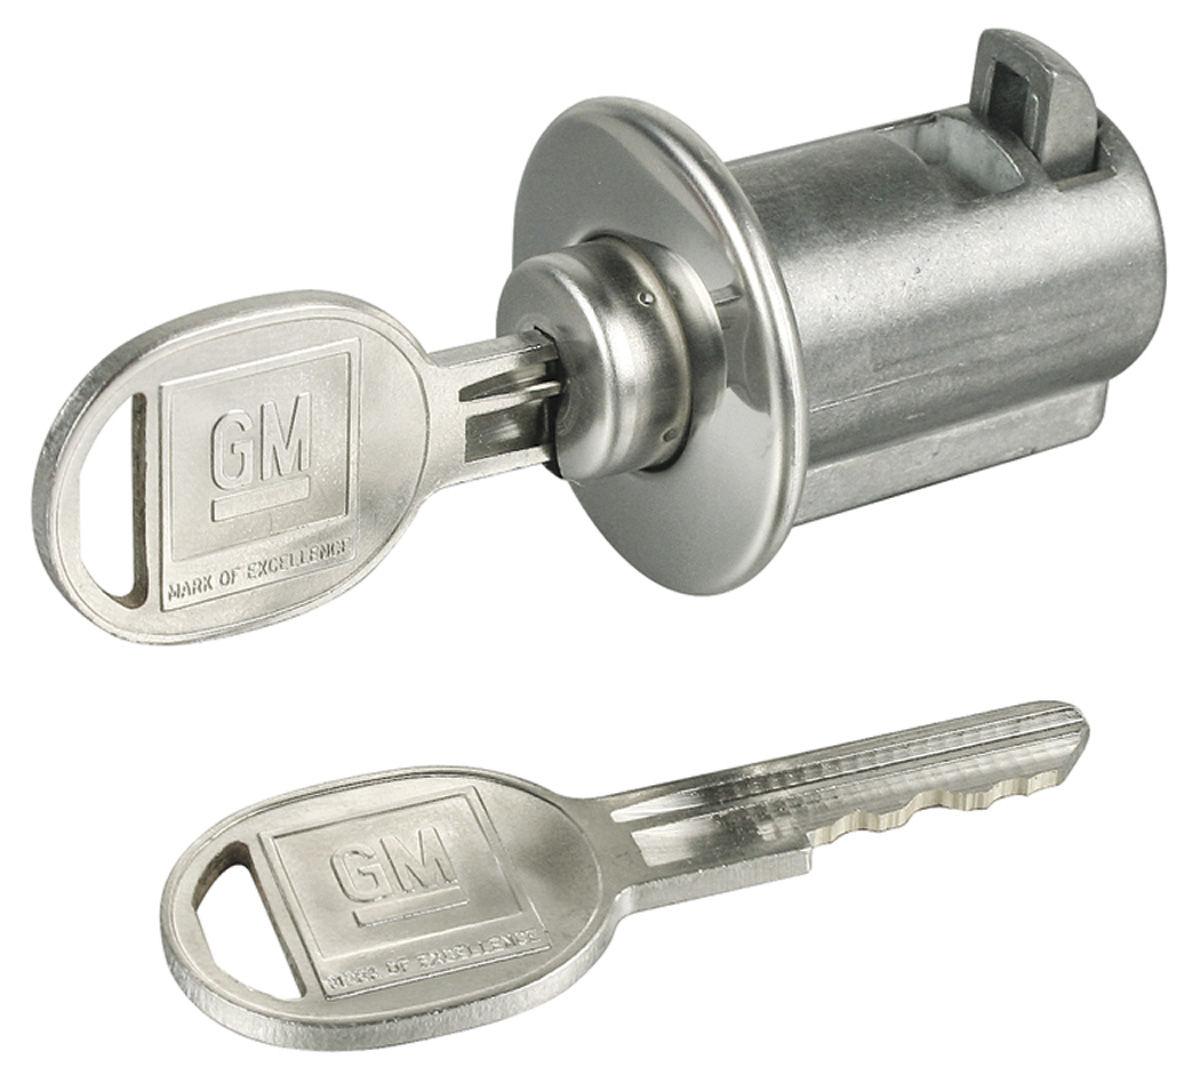 Photo of Tempest Console Lock round key